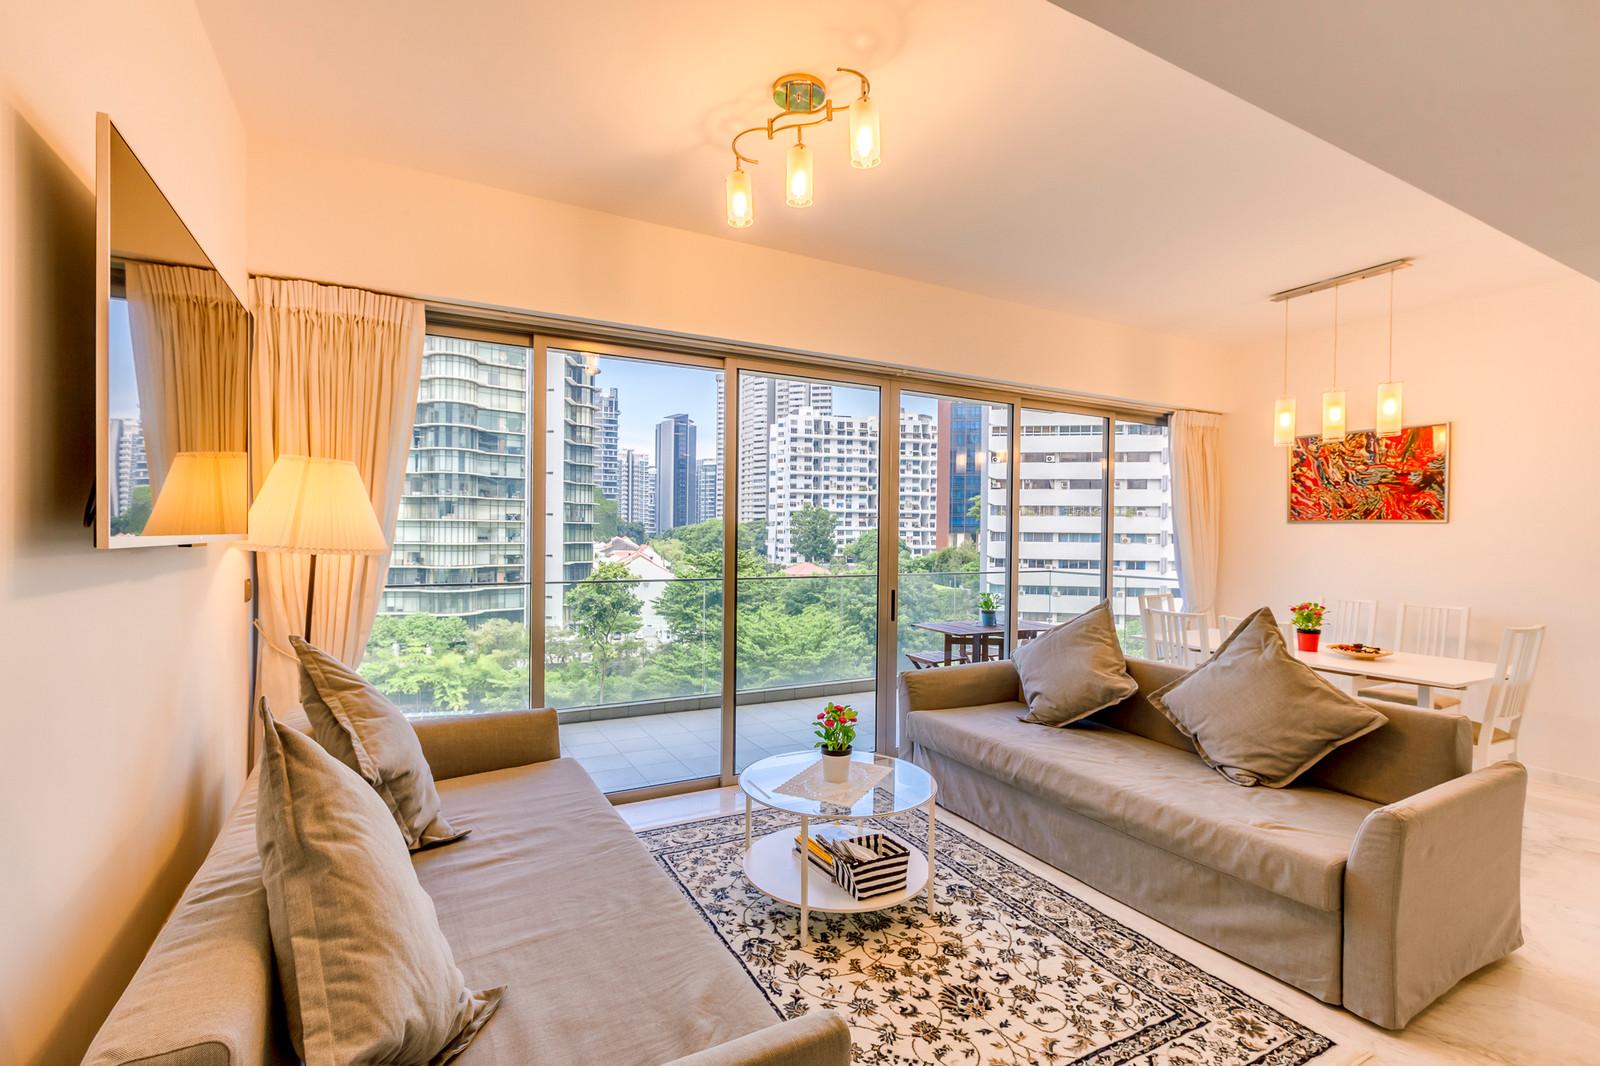 living room furniture ma florida interior design residential photography decorated by siyuan shiya studio singapore